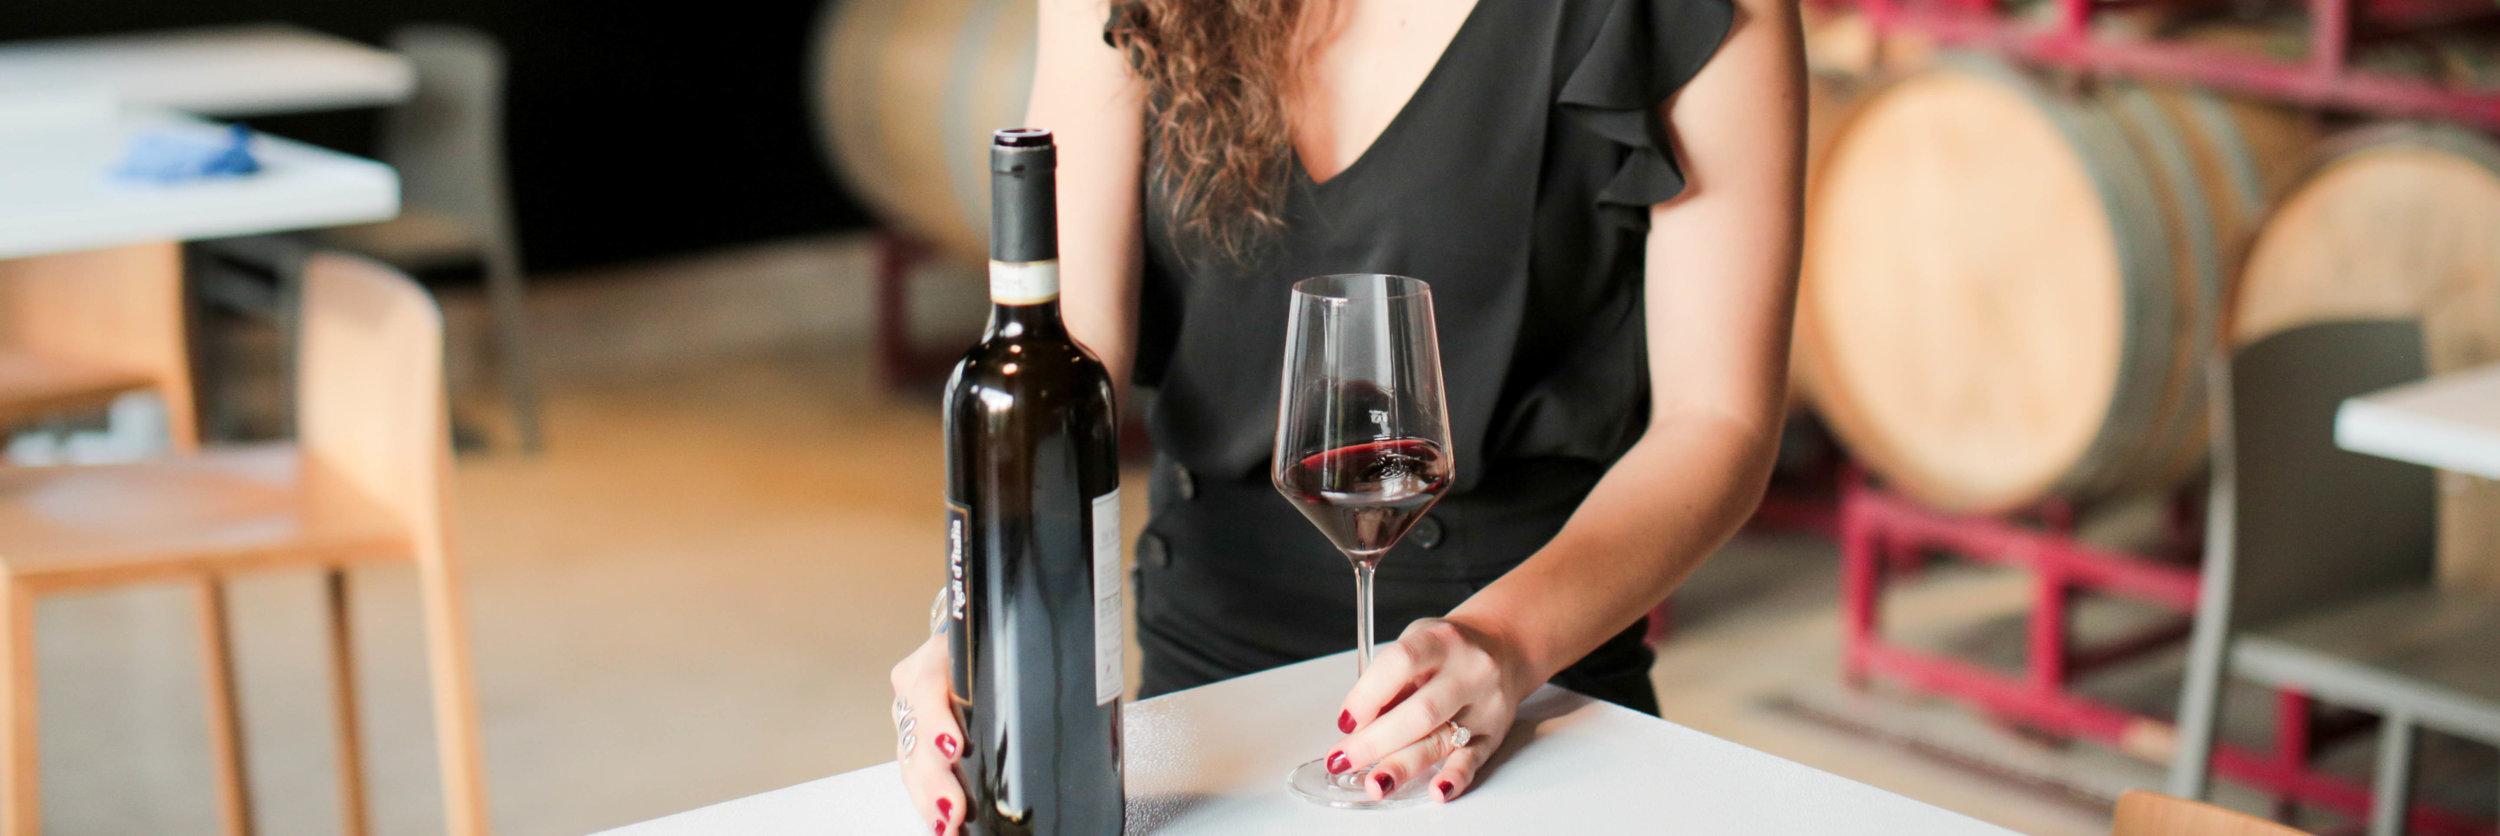 woman-and-wine.JPG